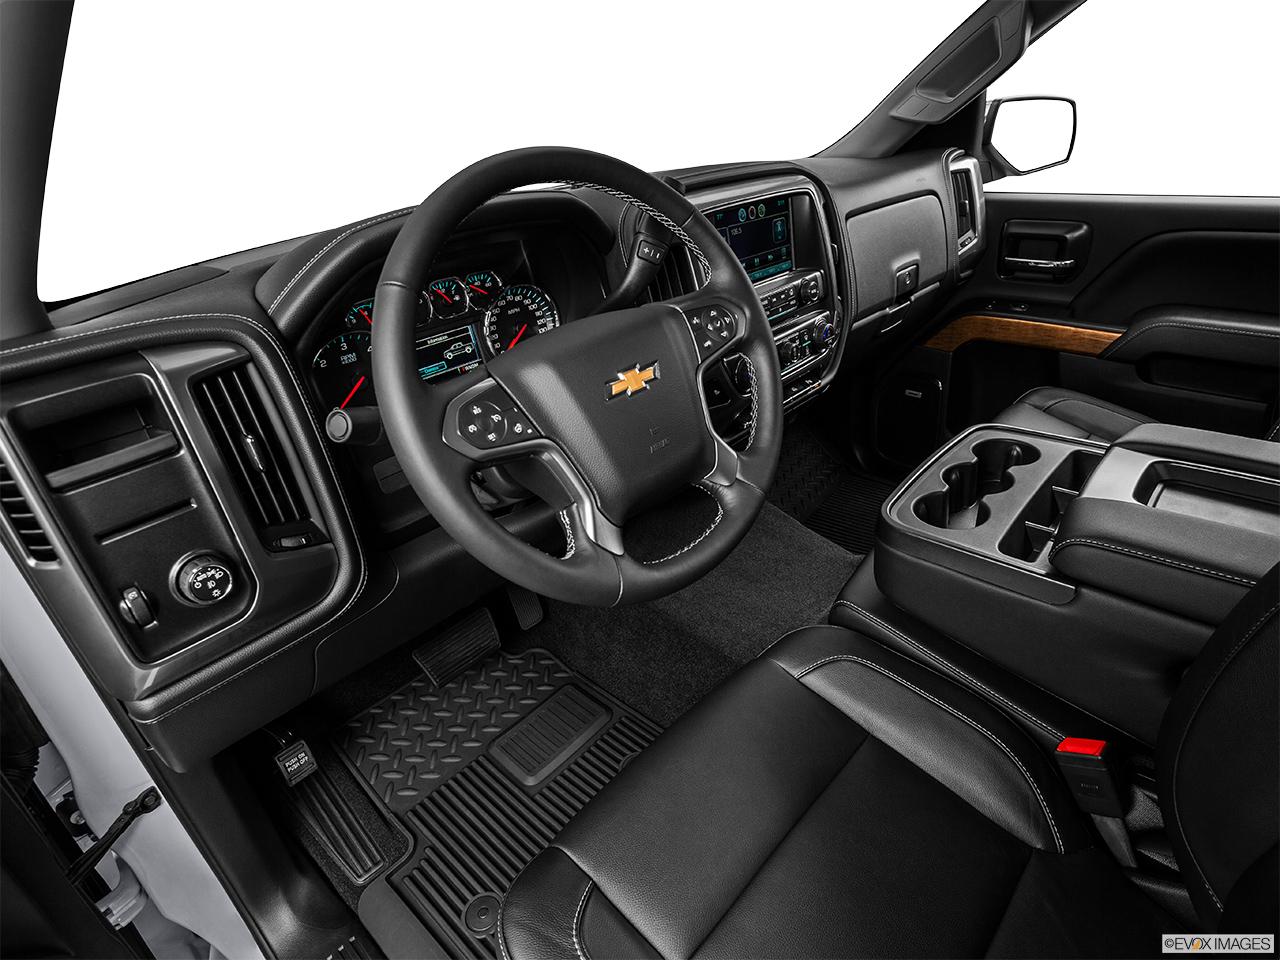 2016 Chevrolet Silverado Ltz Interior Design Auto Electrical